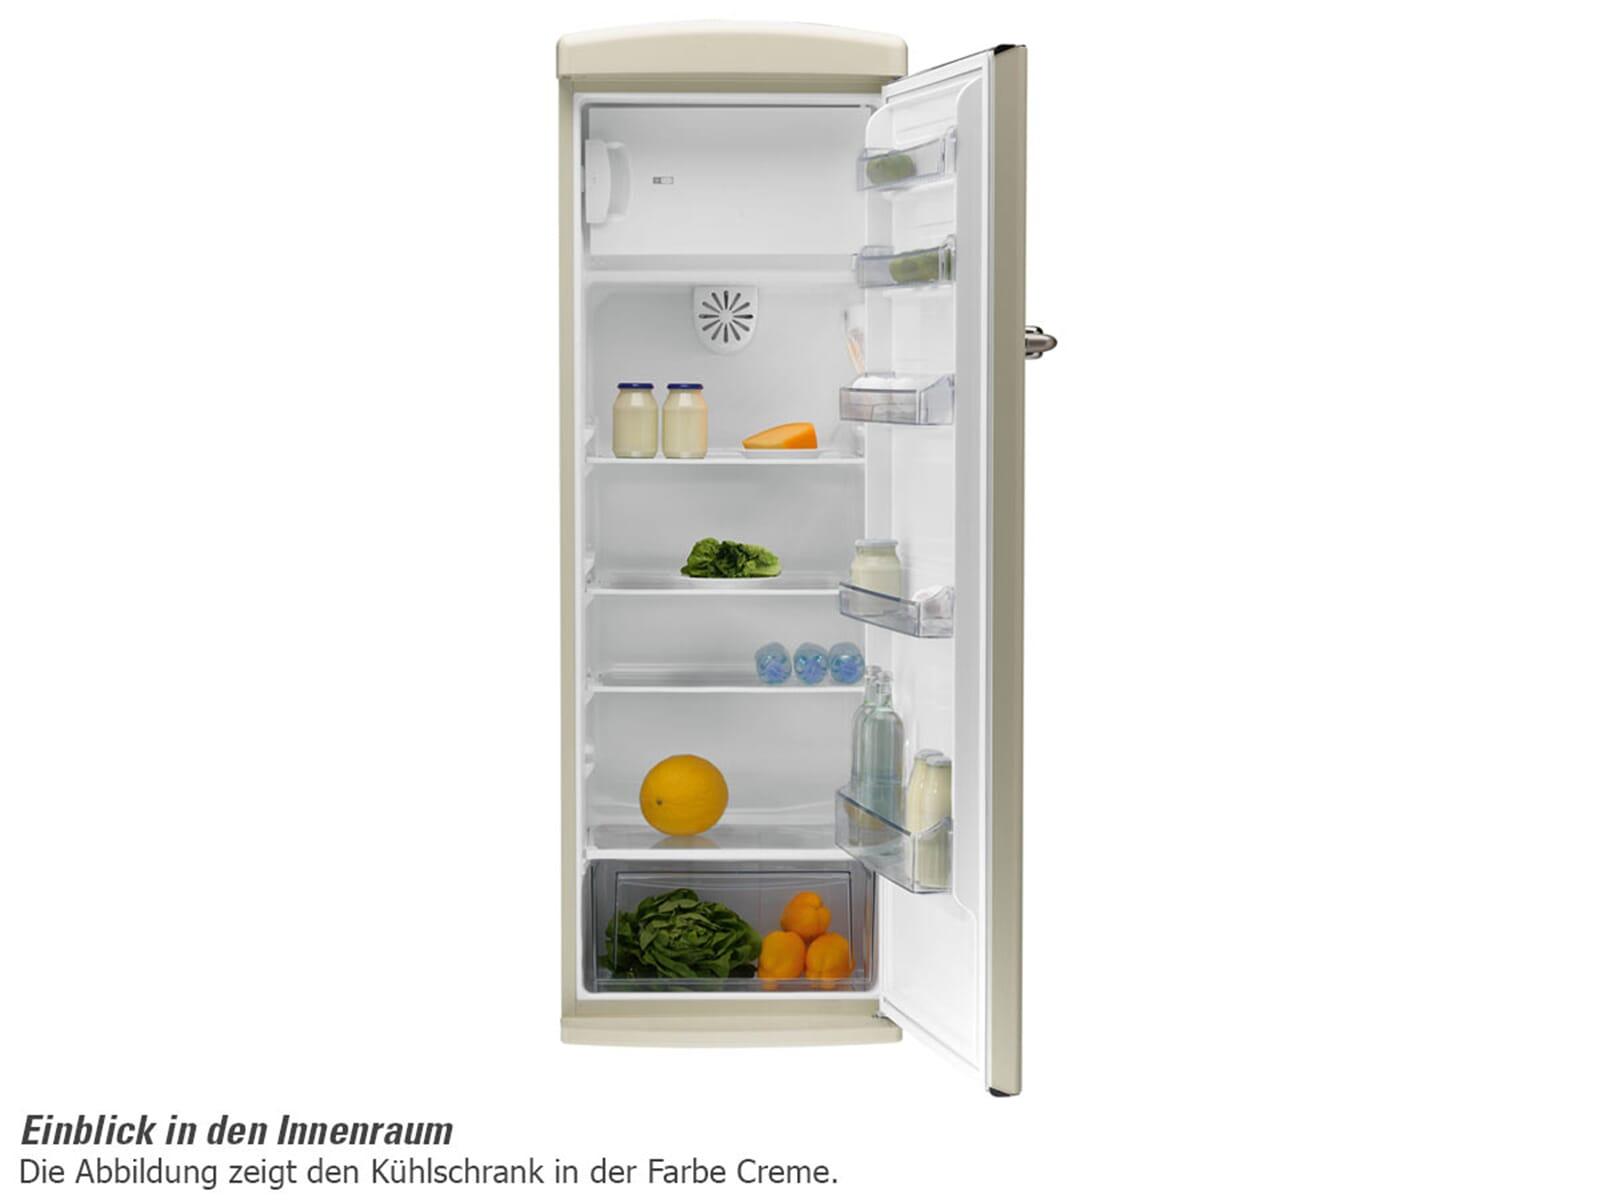 Retro Kühlschrank Oranier : Oranier rks standkühlschrank rot